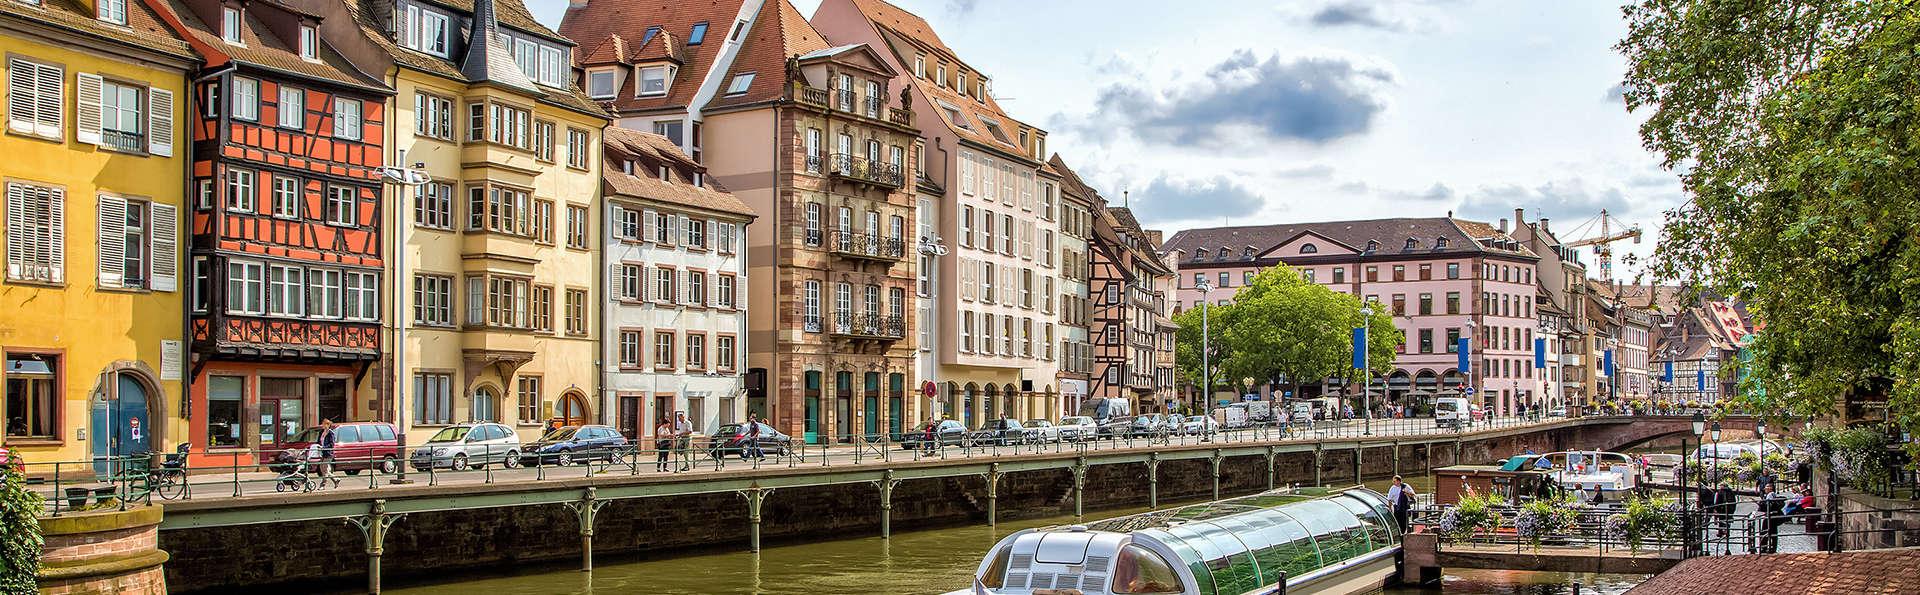 Maison Rouge Strasbourg Hotel & Spa, Autograph Collection  - edit_Strasbourg2.jpg